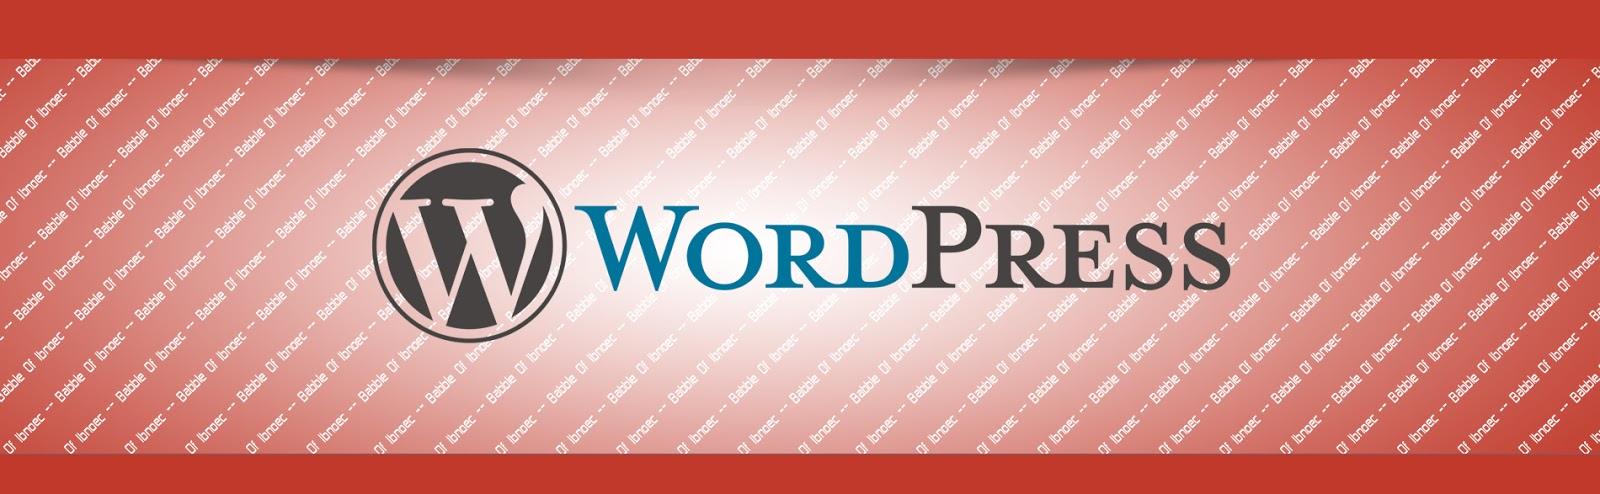 Cara Menampilkan Widget WordPress di Dalam Kolom.